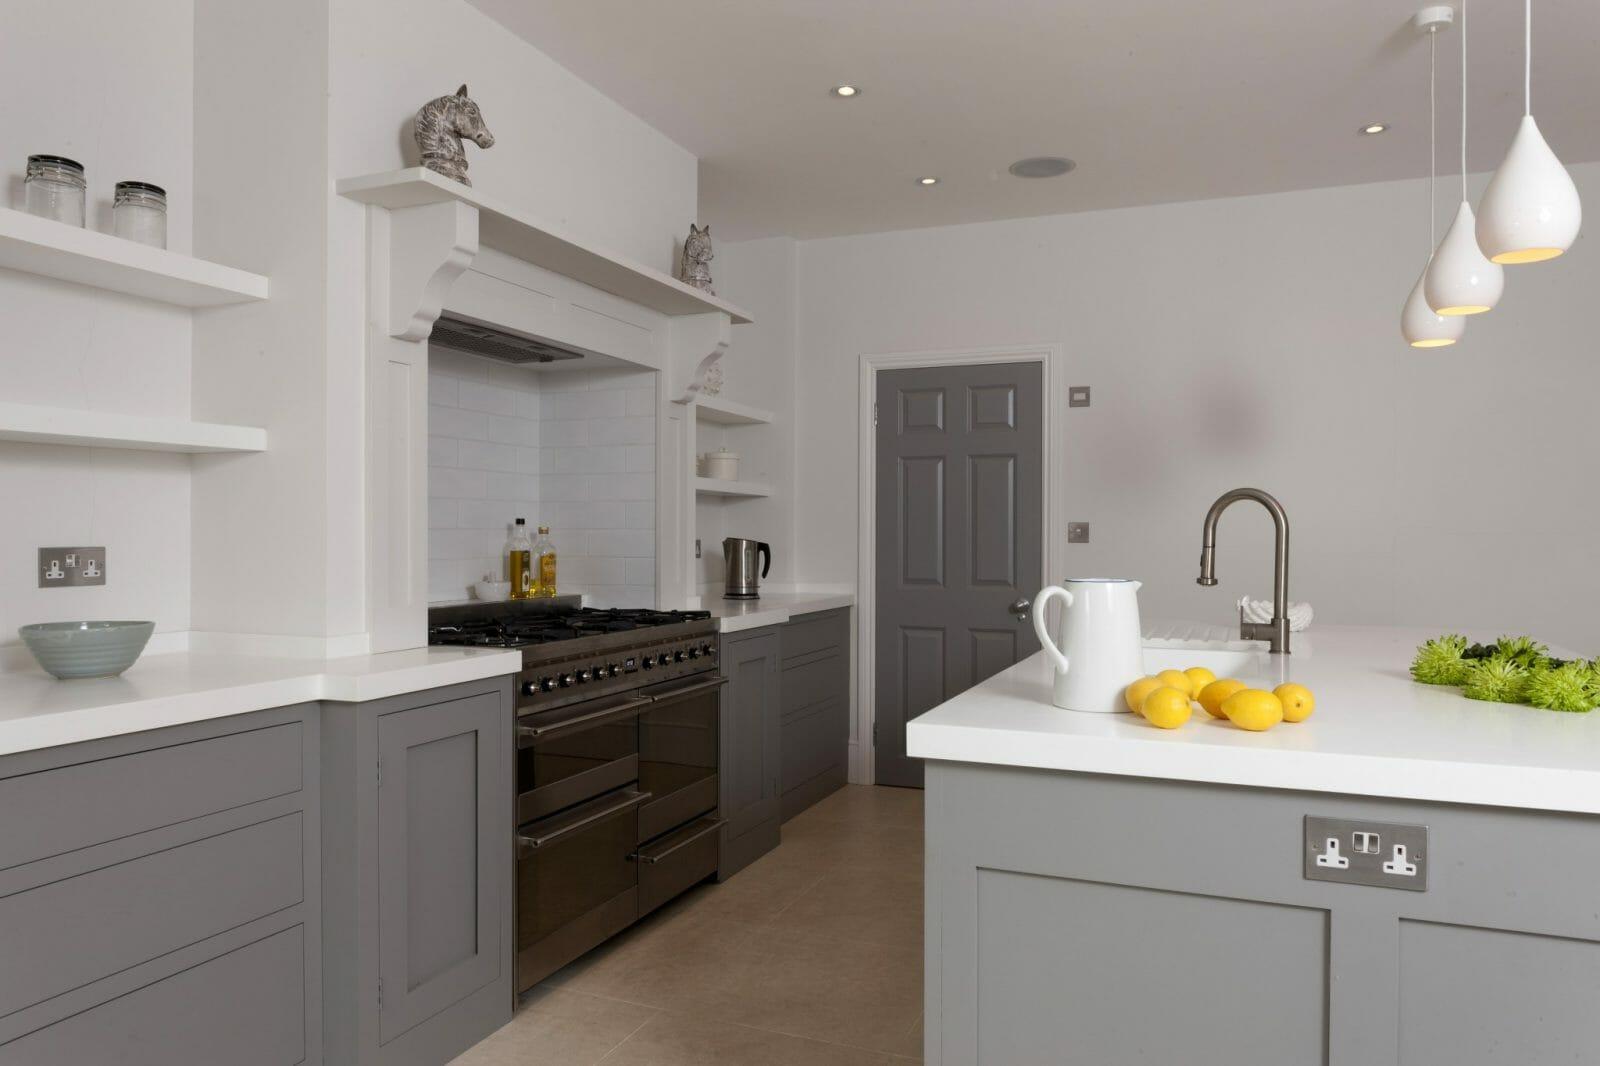 corian kitchen sinks kohler coralais faucet battersea london handleless shaker - higham furniture